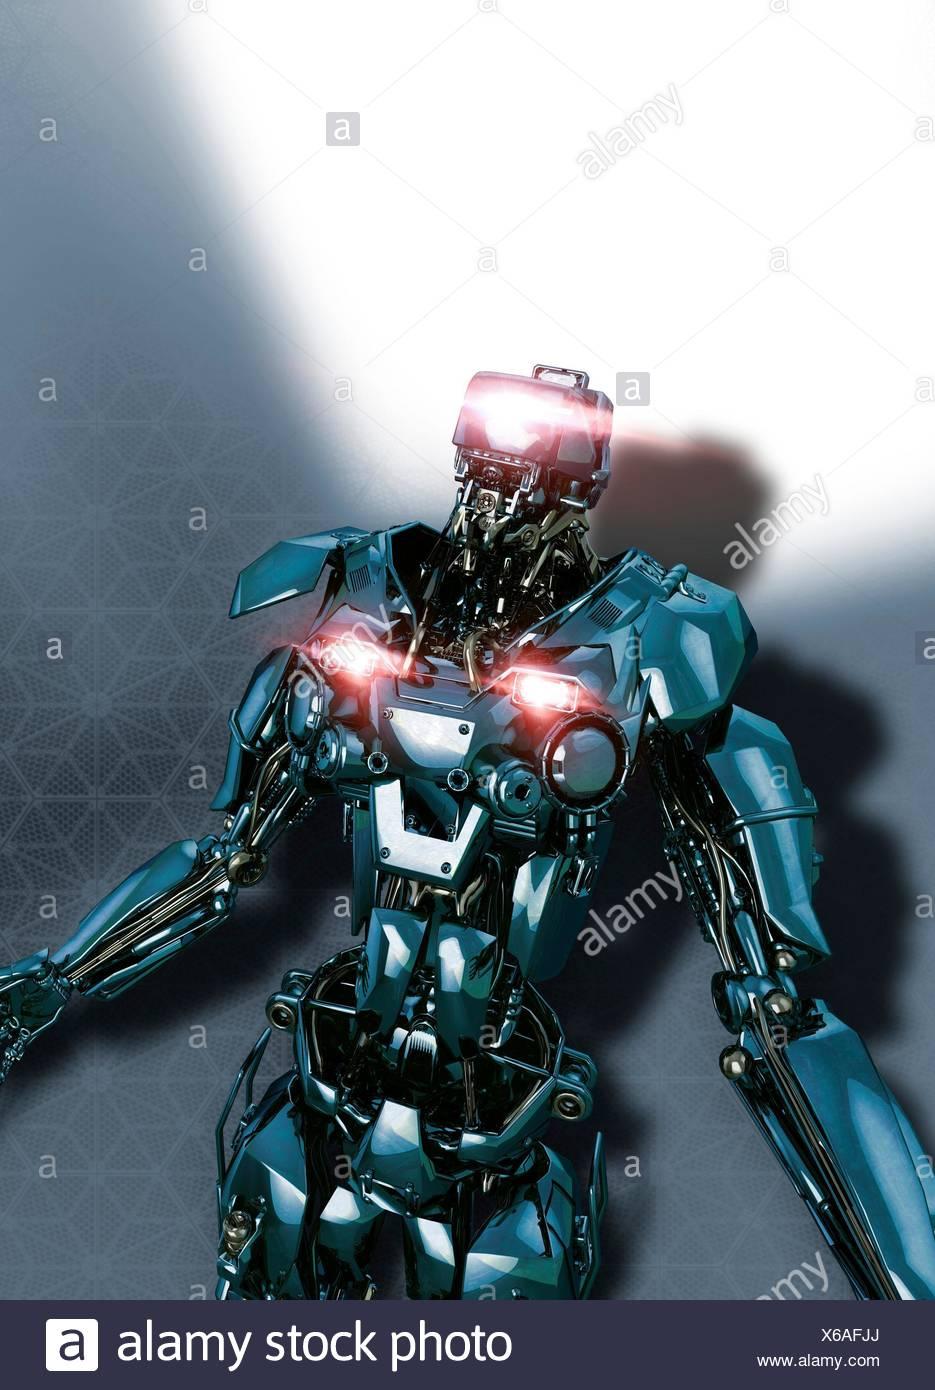 Robot, illustration. - Stock Image